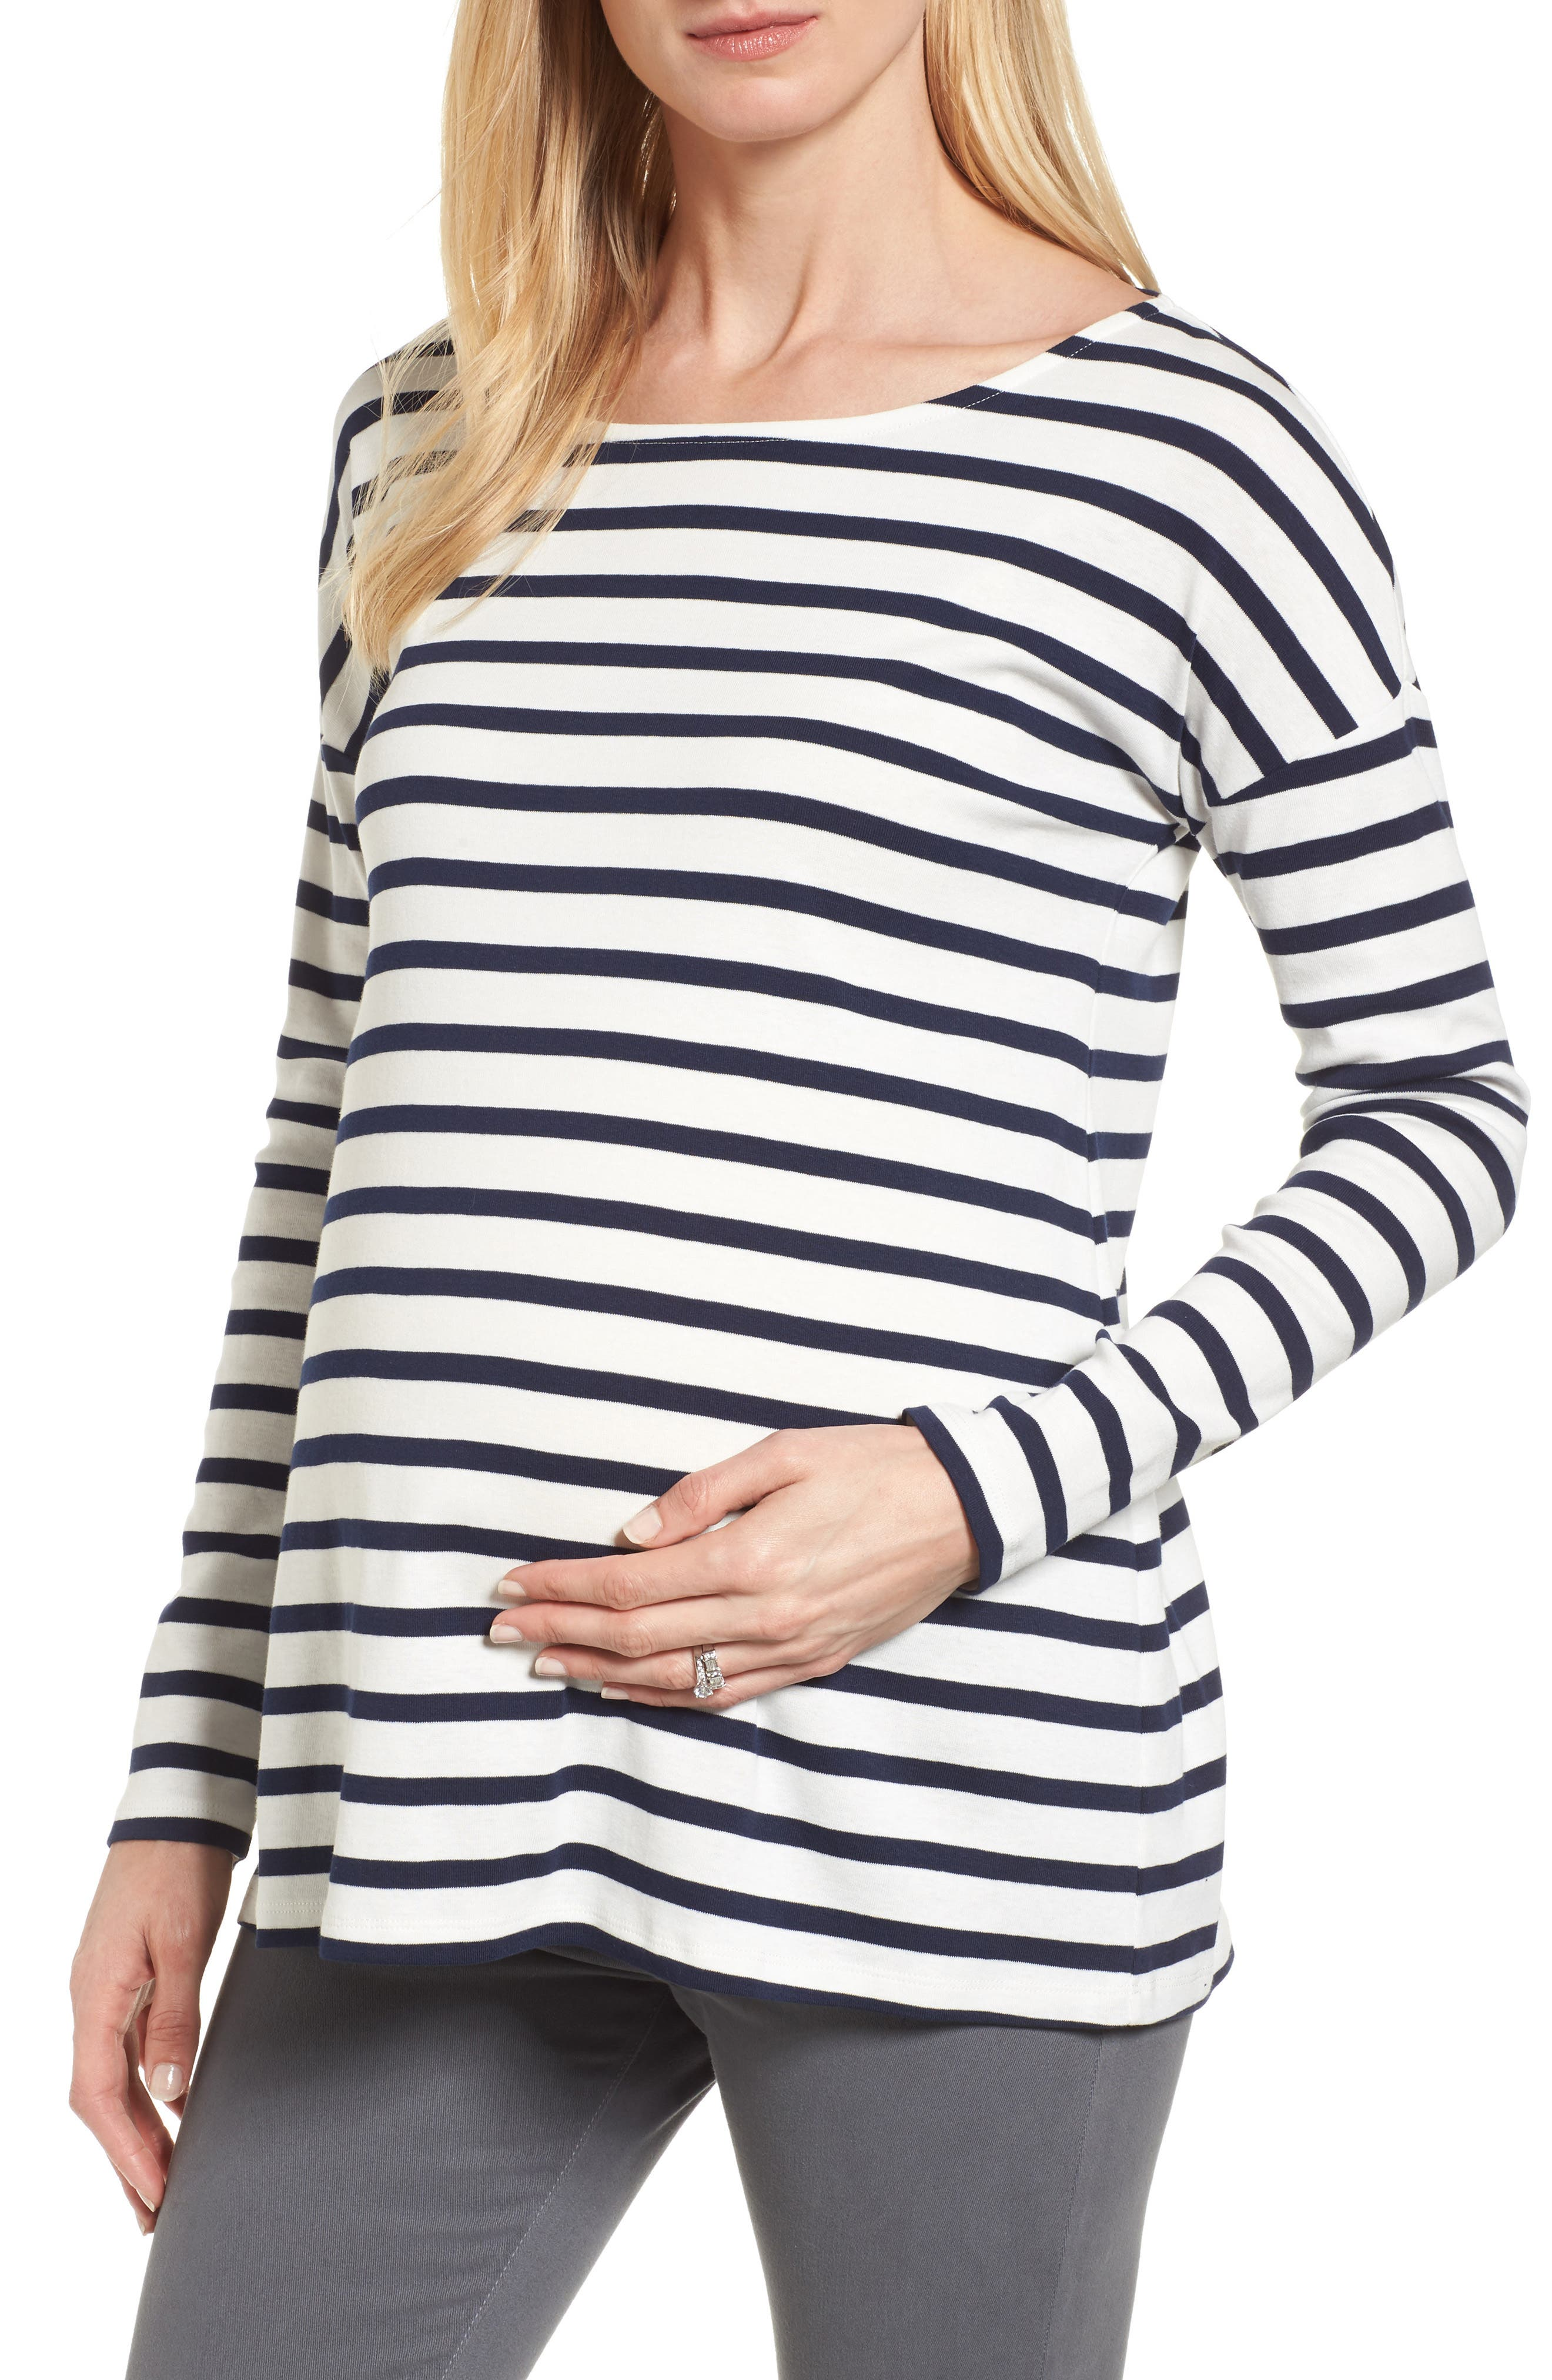 Caia Stripe Maternity Top,                         Main,                         color, NAVY/ WHITE STRIPE